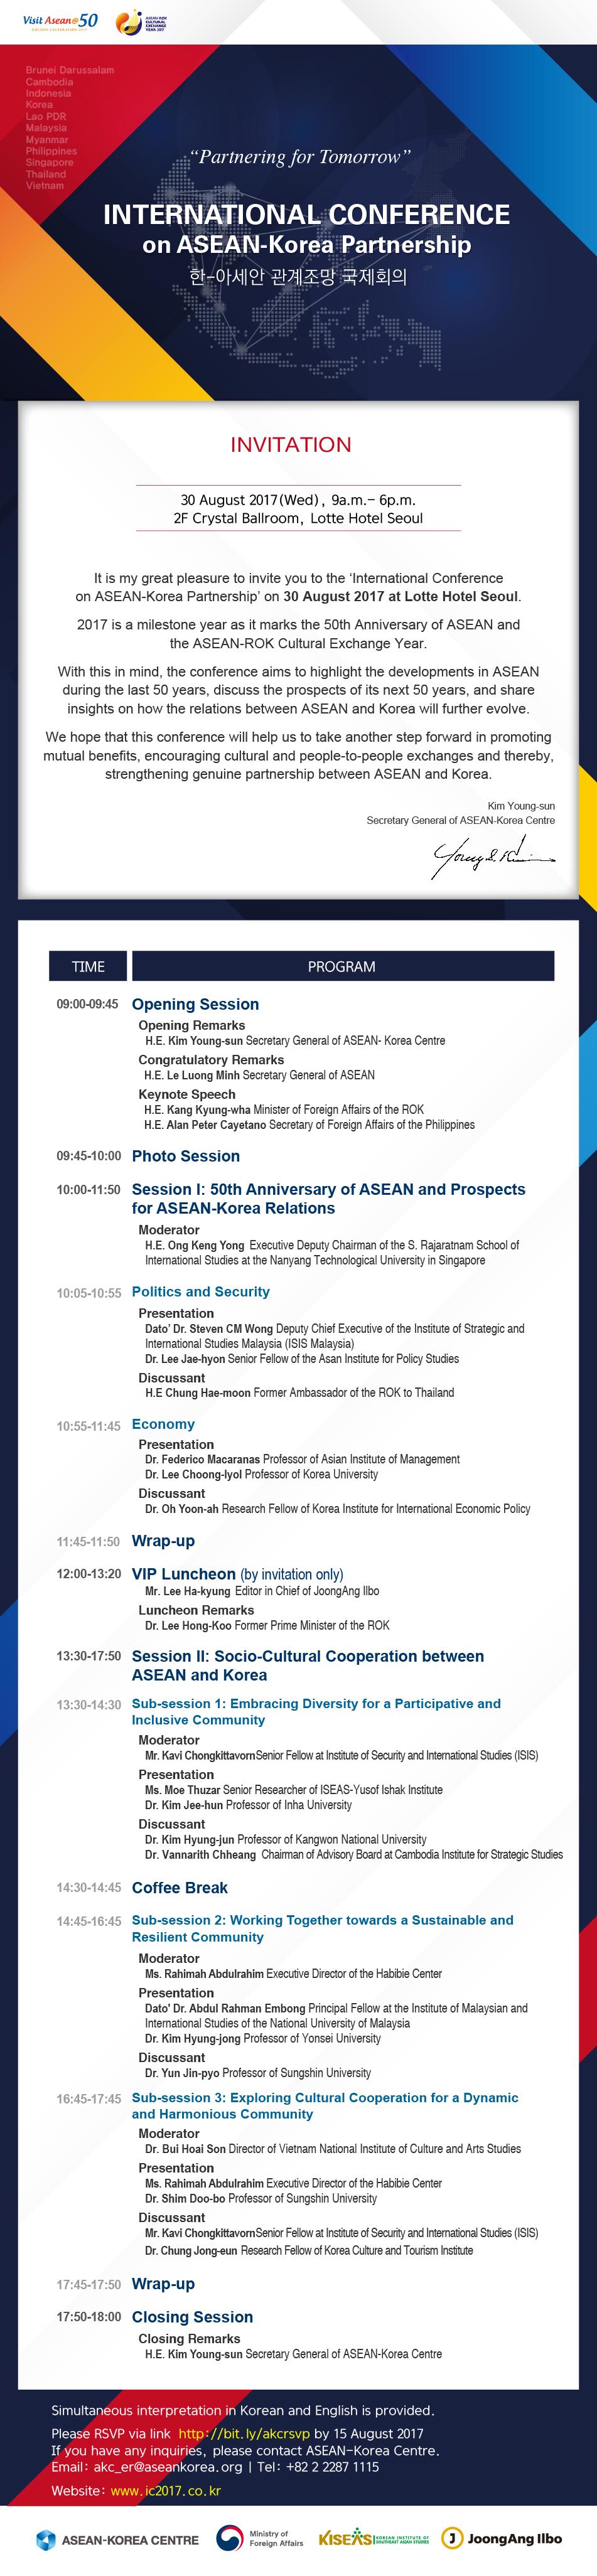 ASEAN-KOREA CENTRE : News & Media - Press Room : Past, present, and